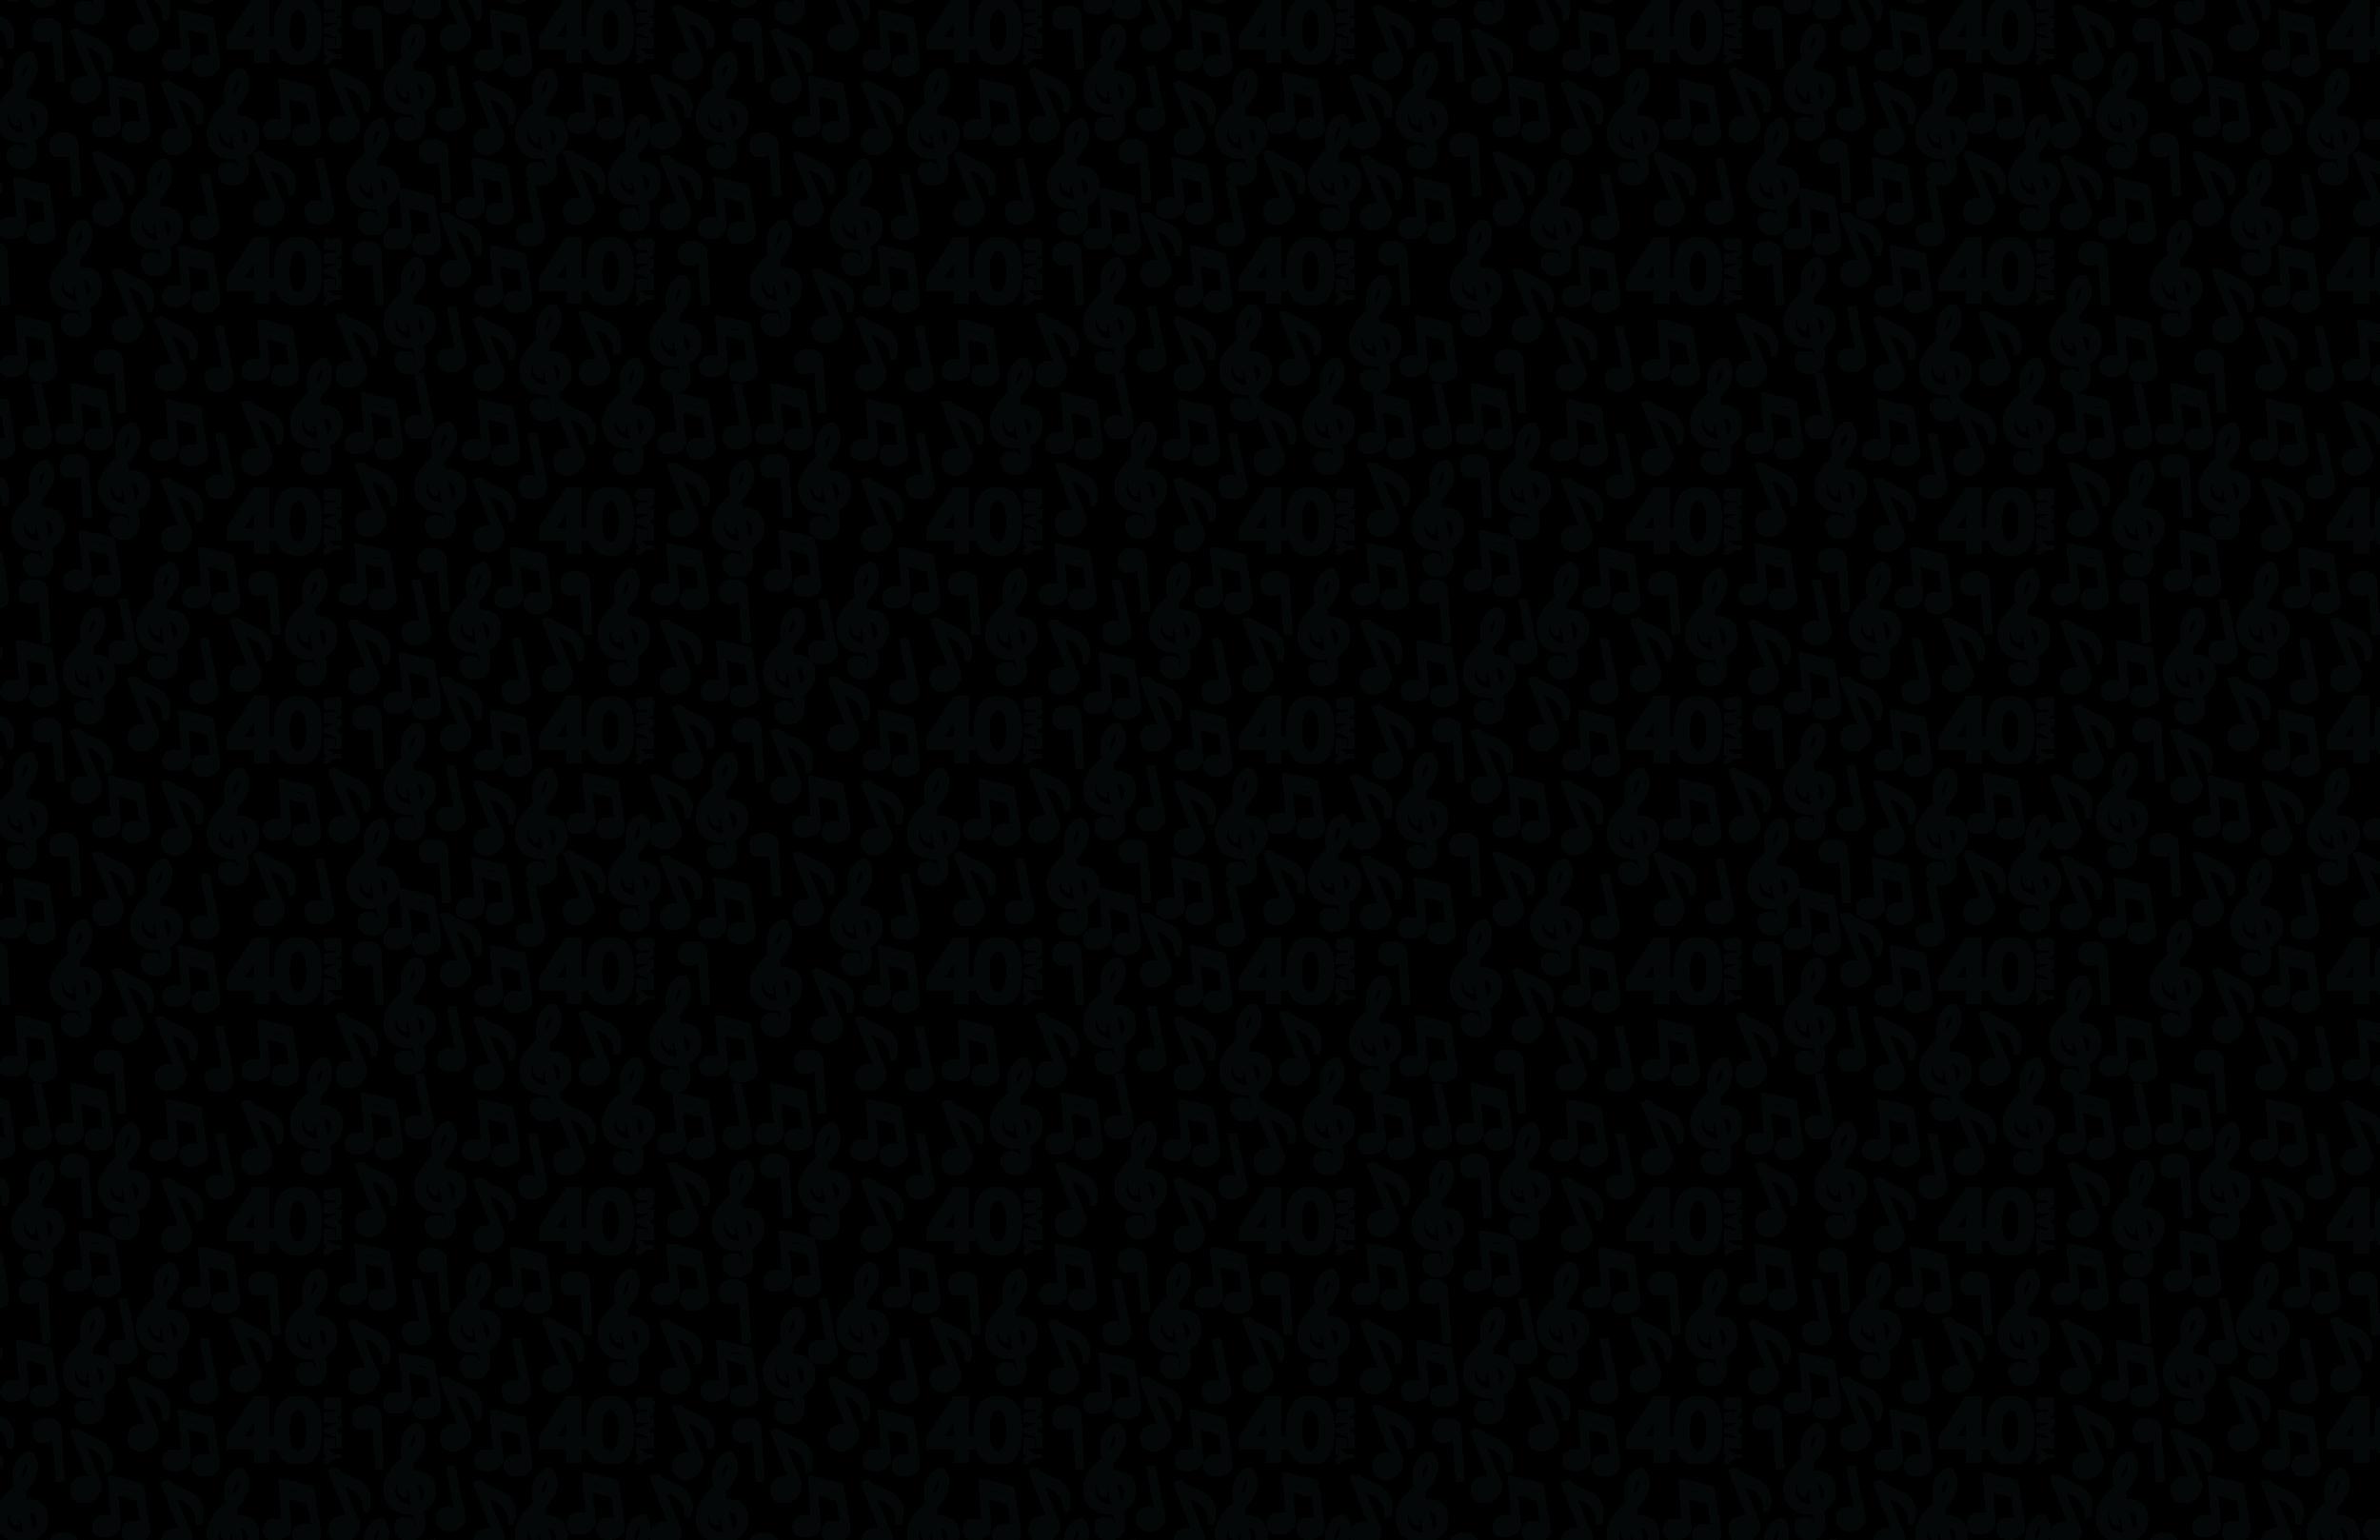 Pattern_Music&40_11x17_Black_2.png